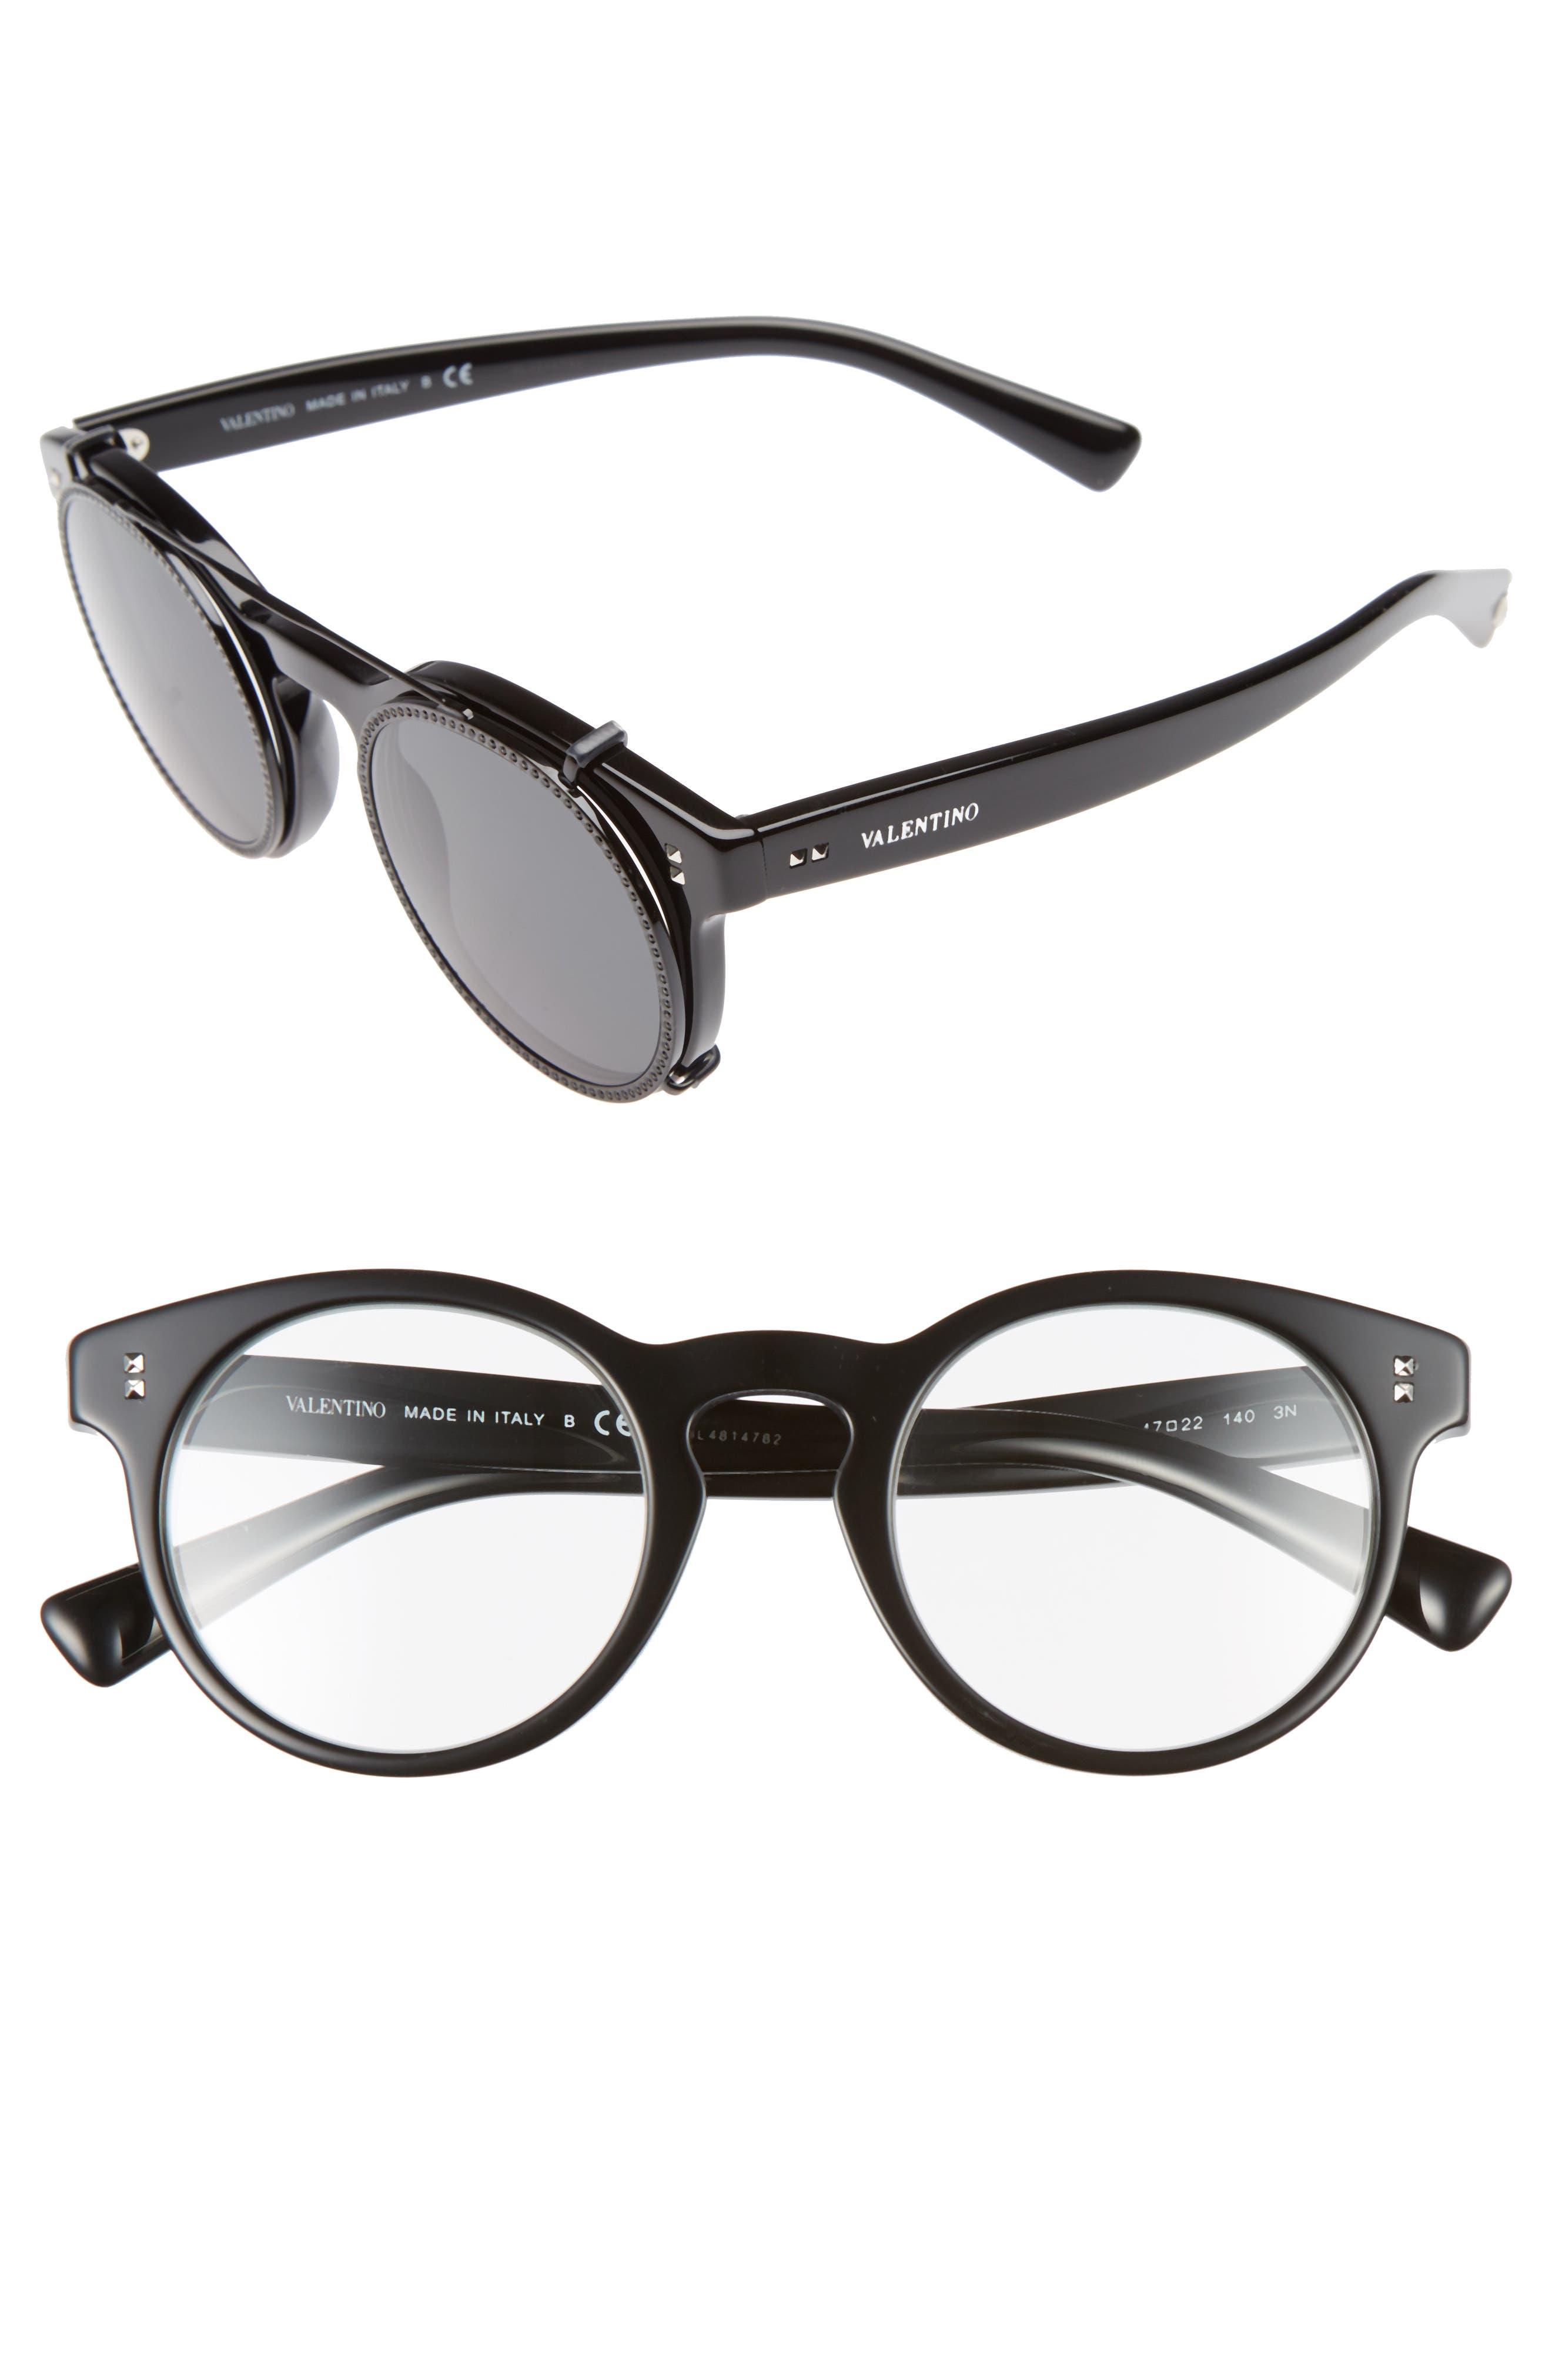 47mm Round Sunglasses,                             Main thumbnail 1, color,                             001